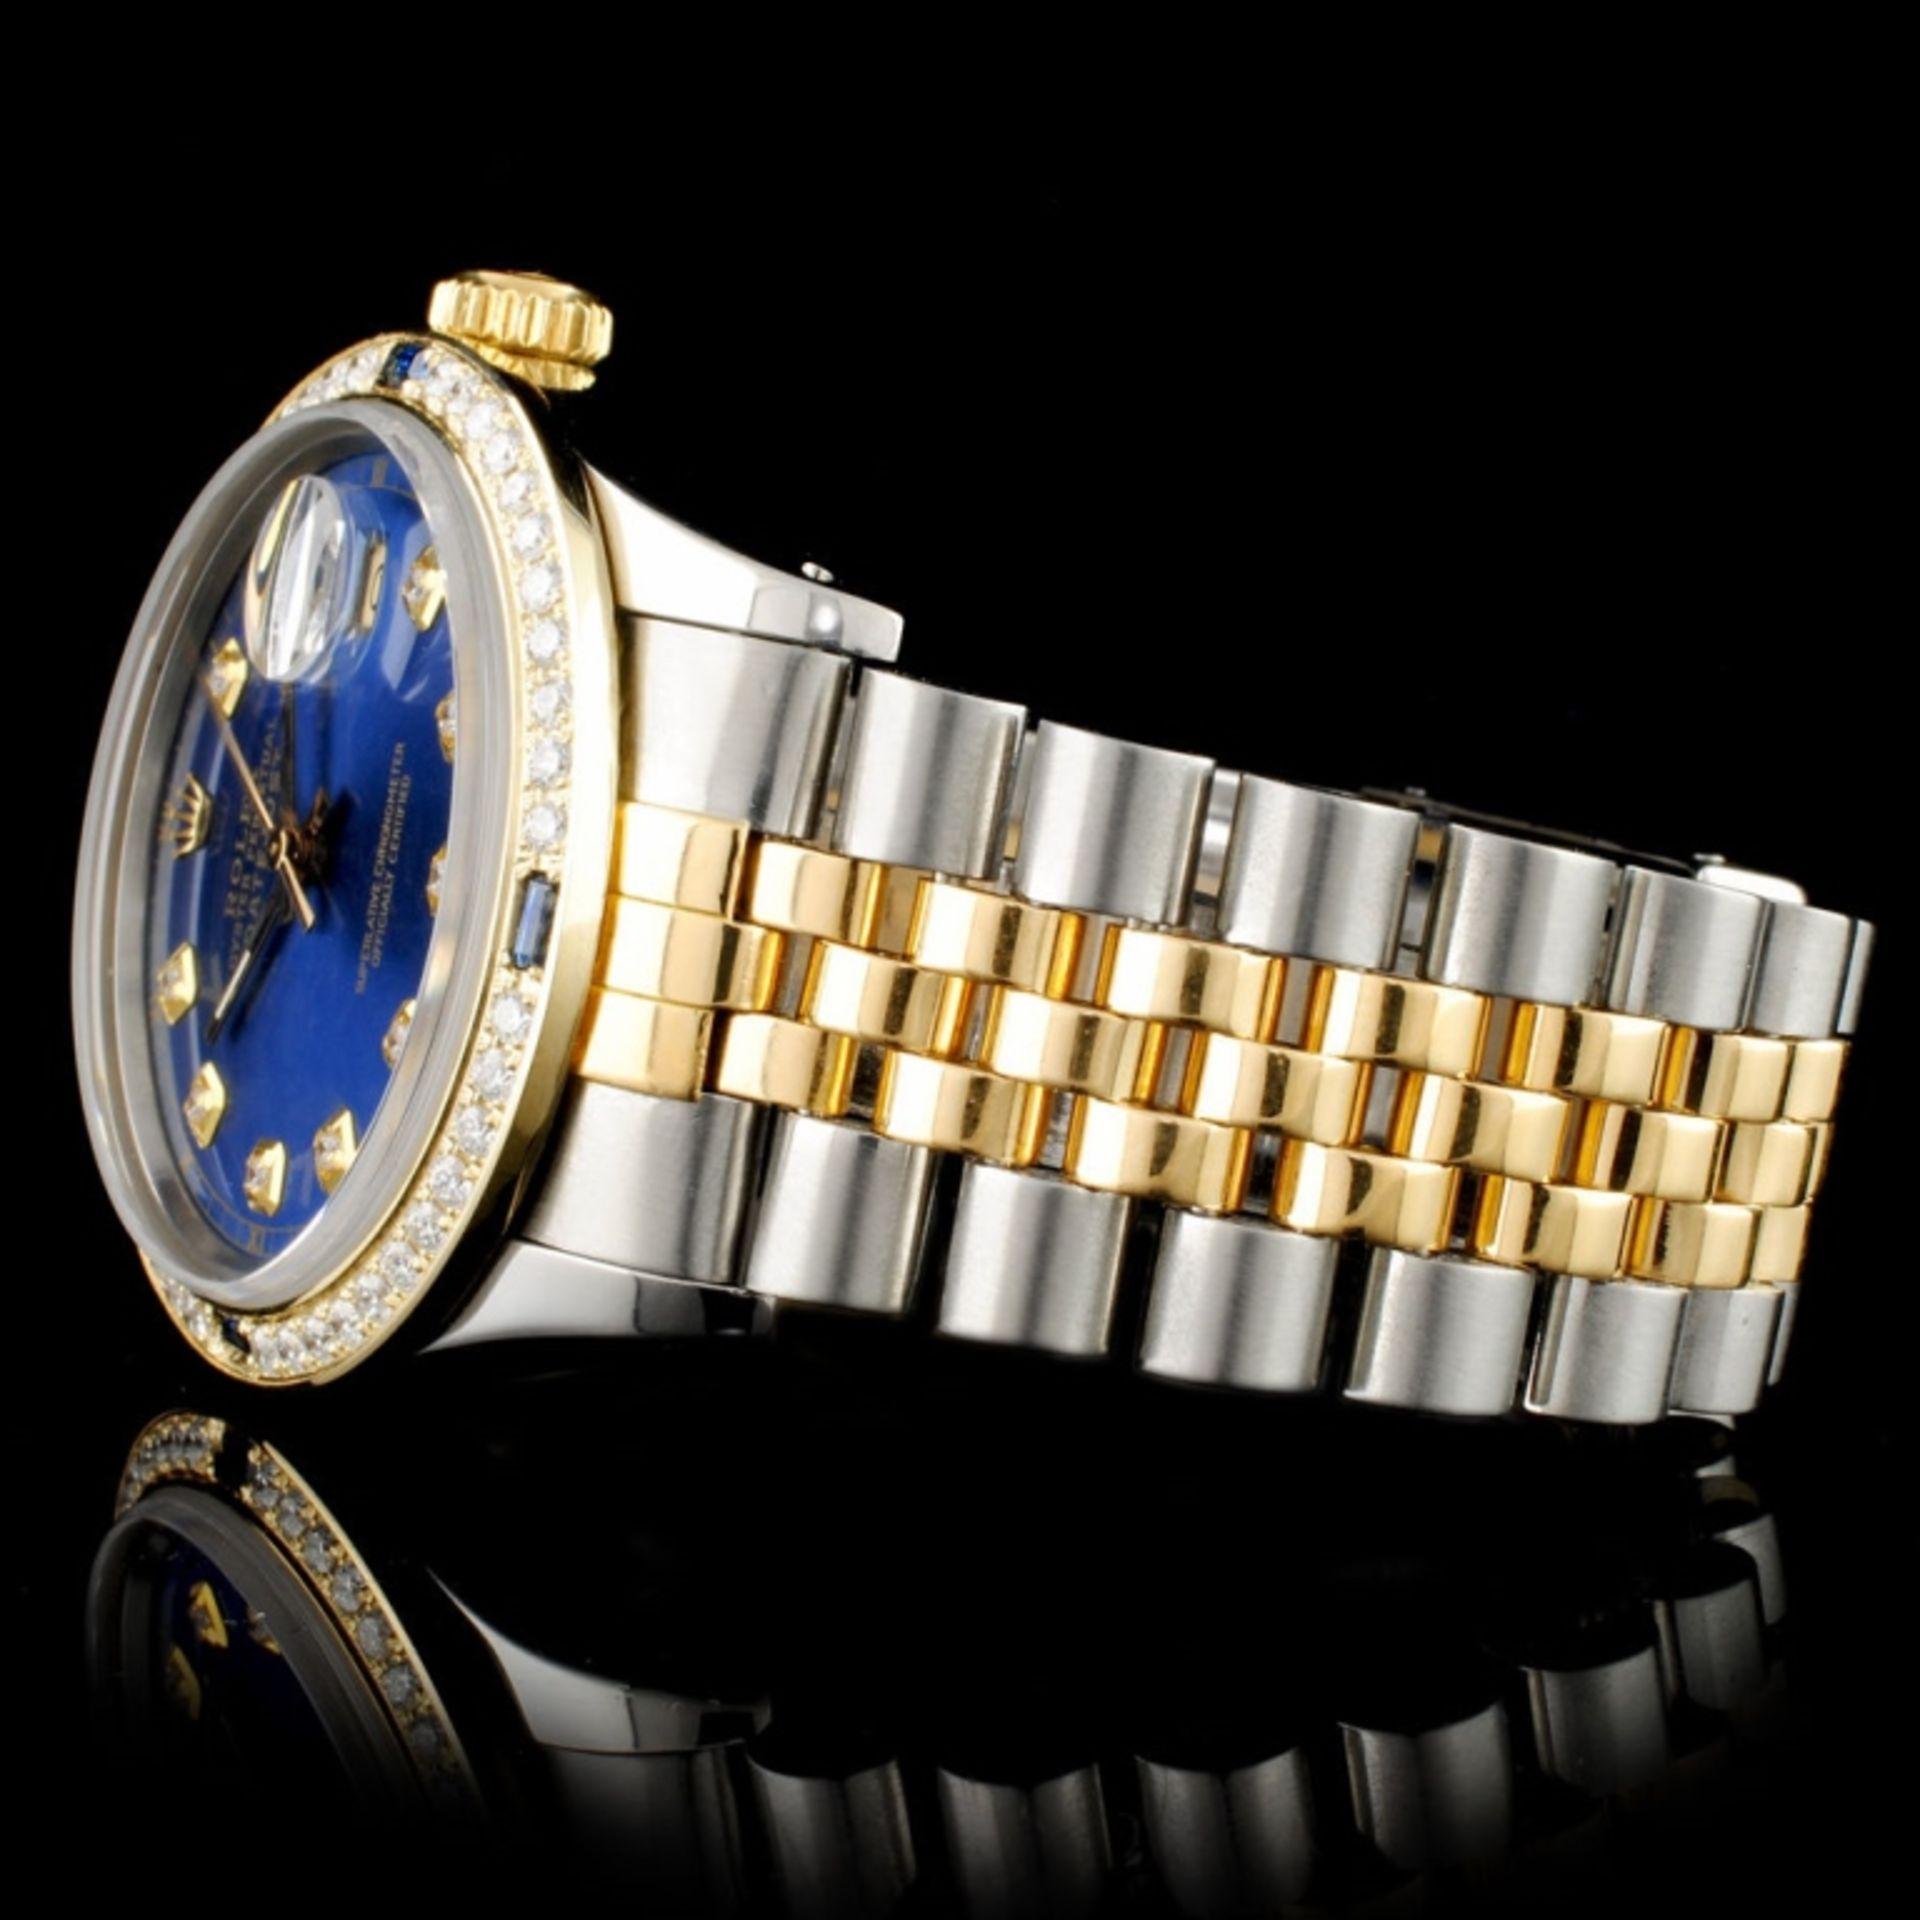 Rolex DateJust 36MM 1.50ct Diamond Wristwatch - Image 6 of 7